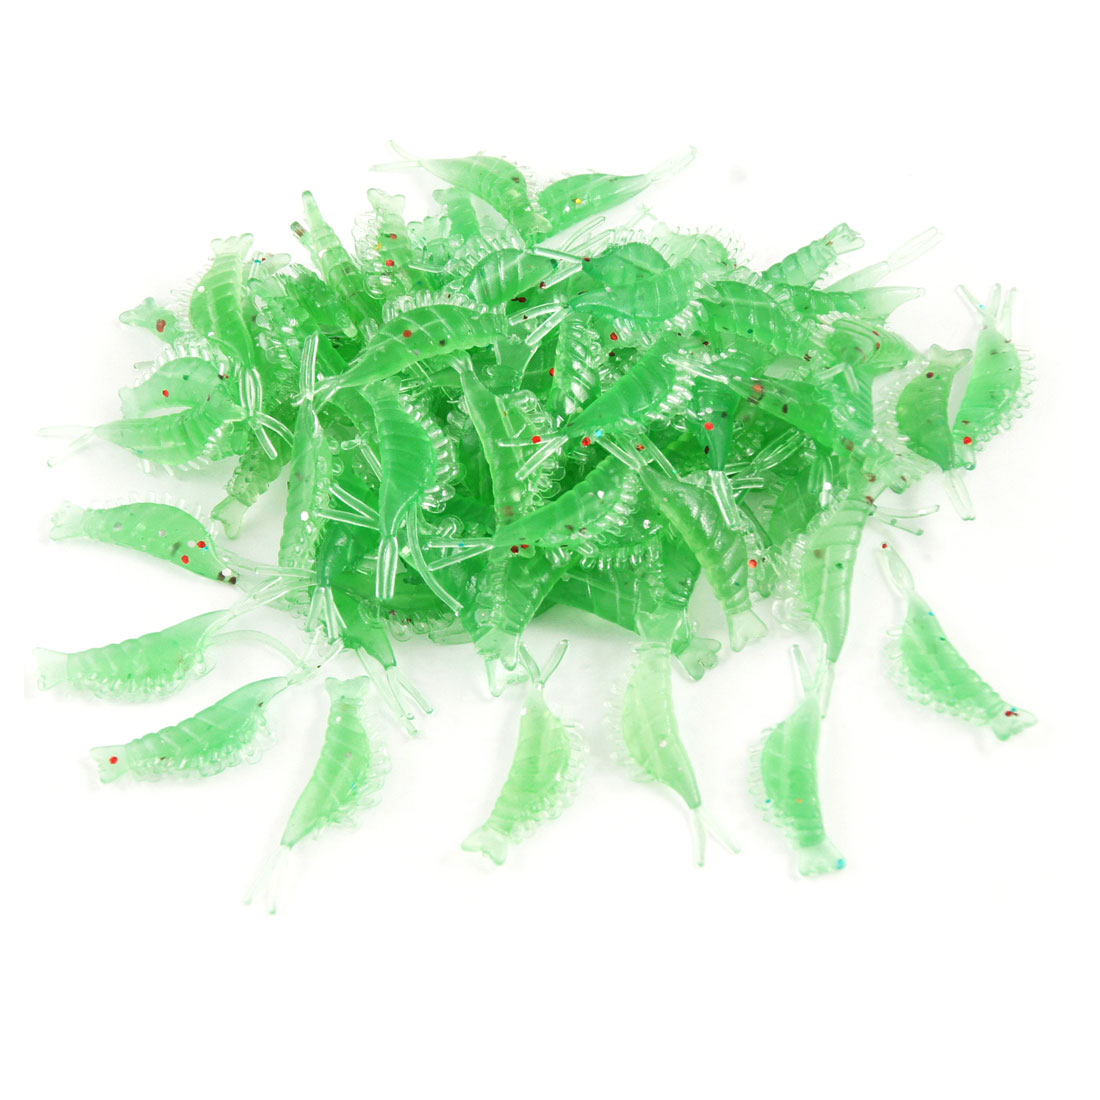 100 Pcs Silicone Soft Green Shrimp Shaped Fishing Lure Baits